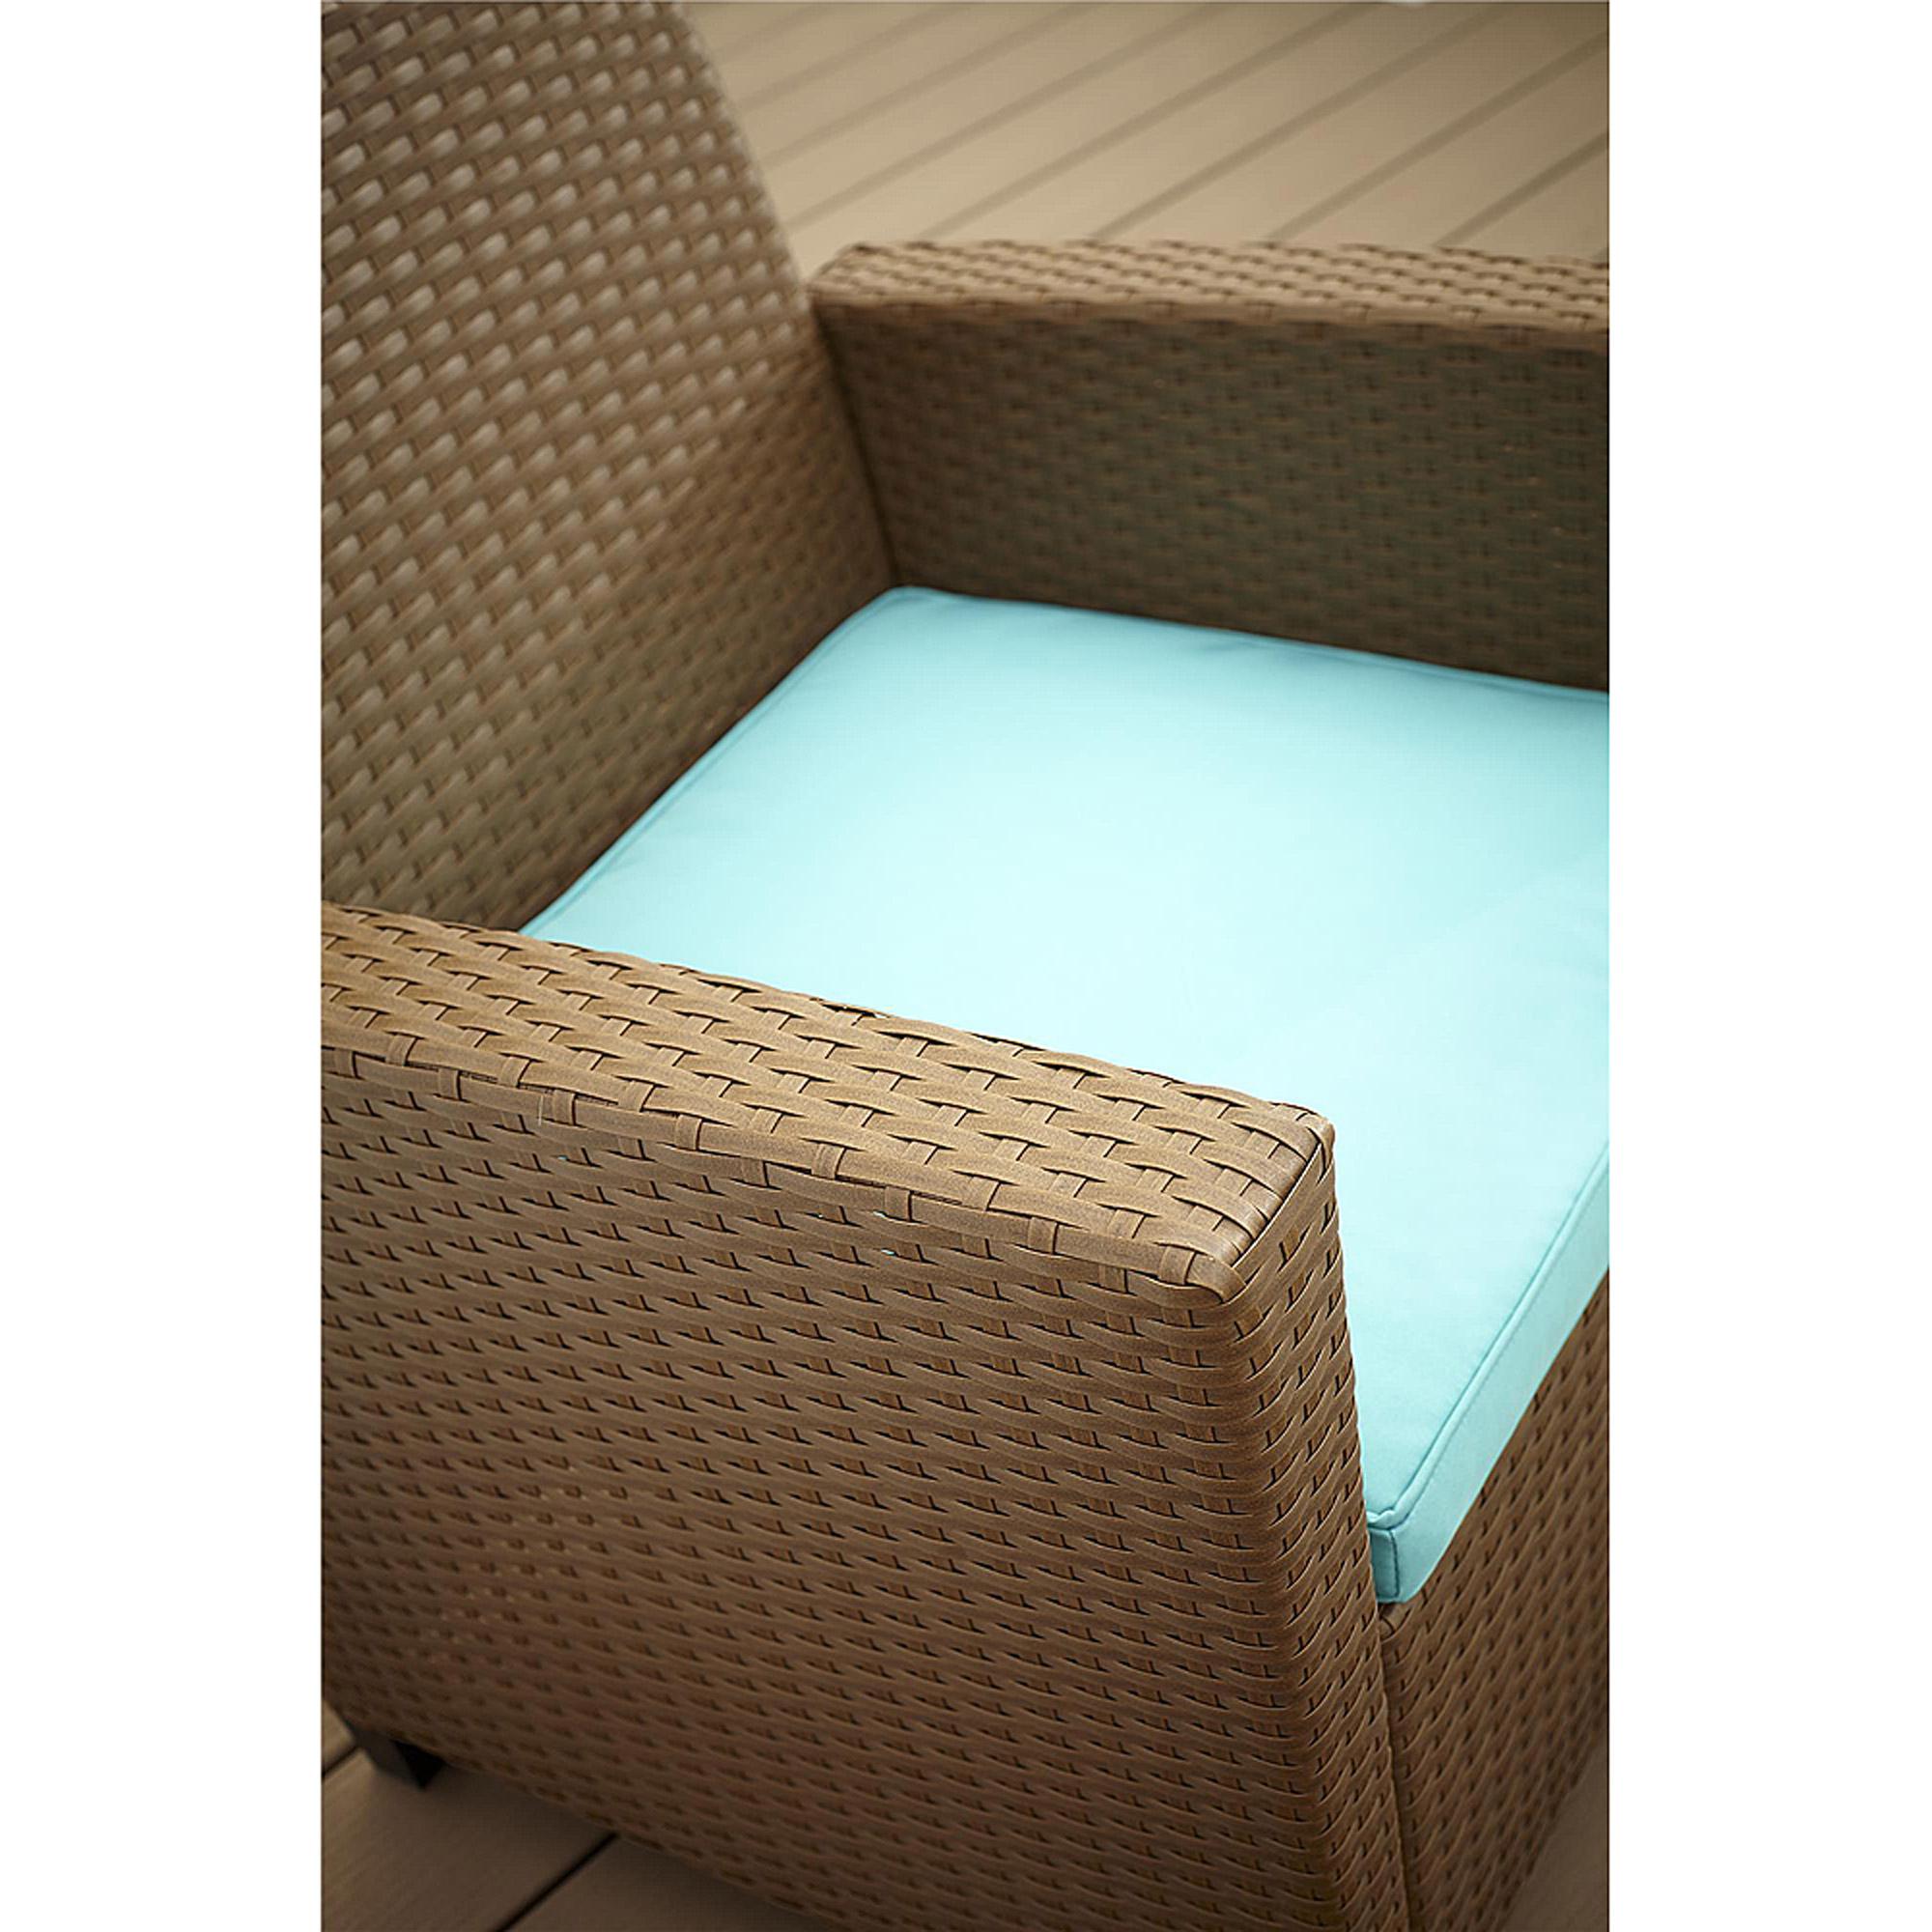 Teal Furniture Cosco Outdoor Malmo 4Piece Resin Wicker Patio Conversation Set